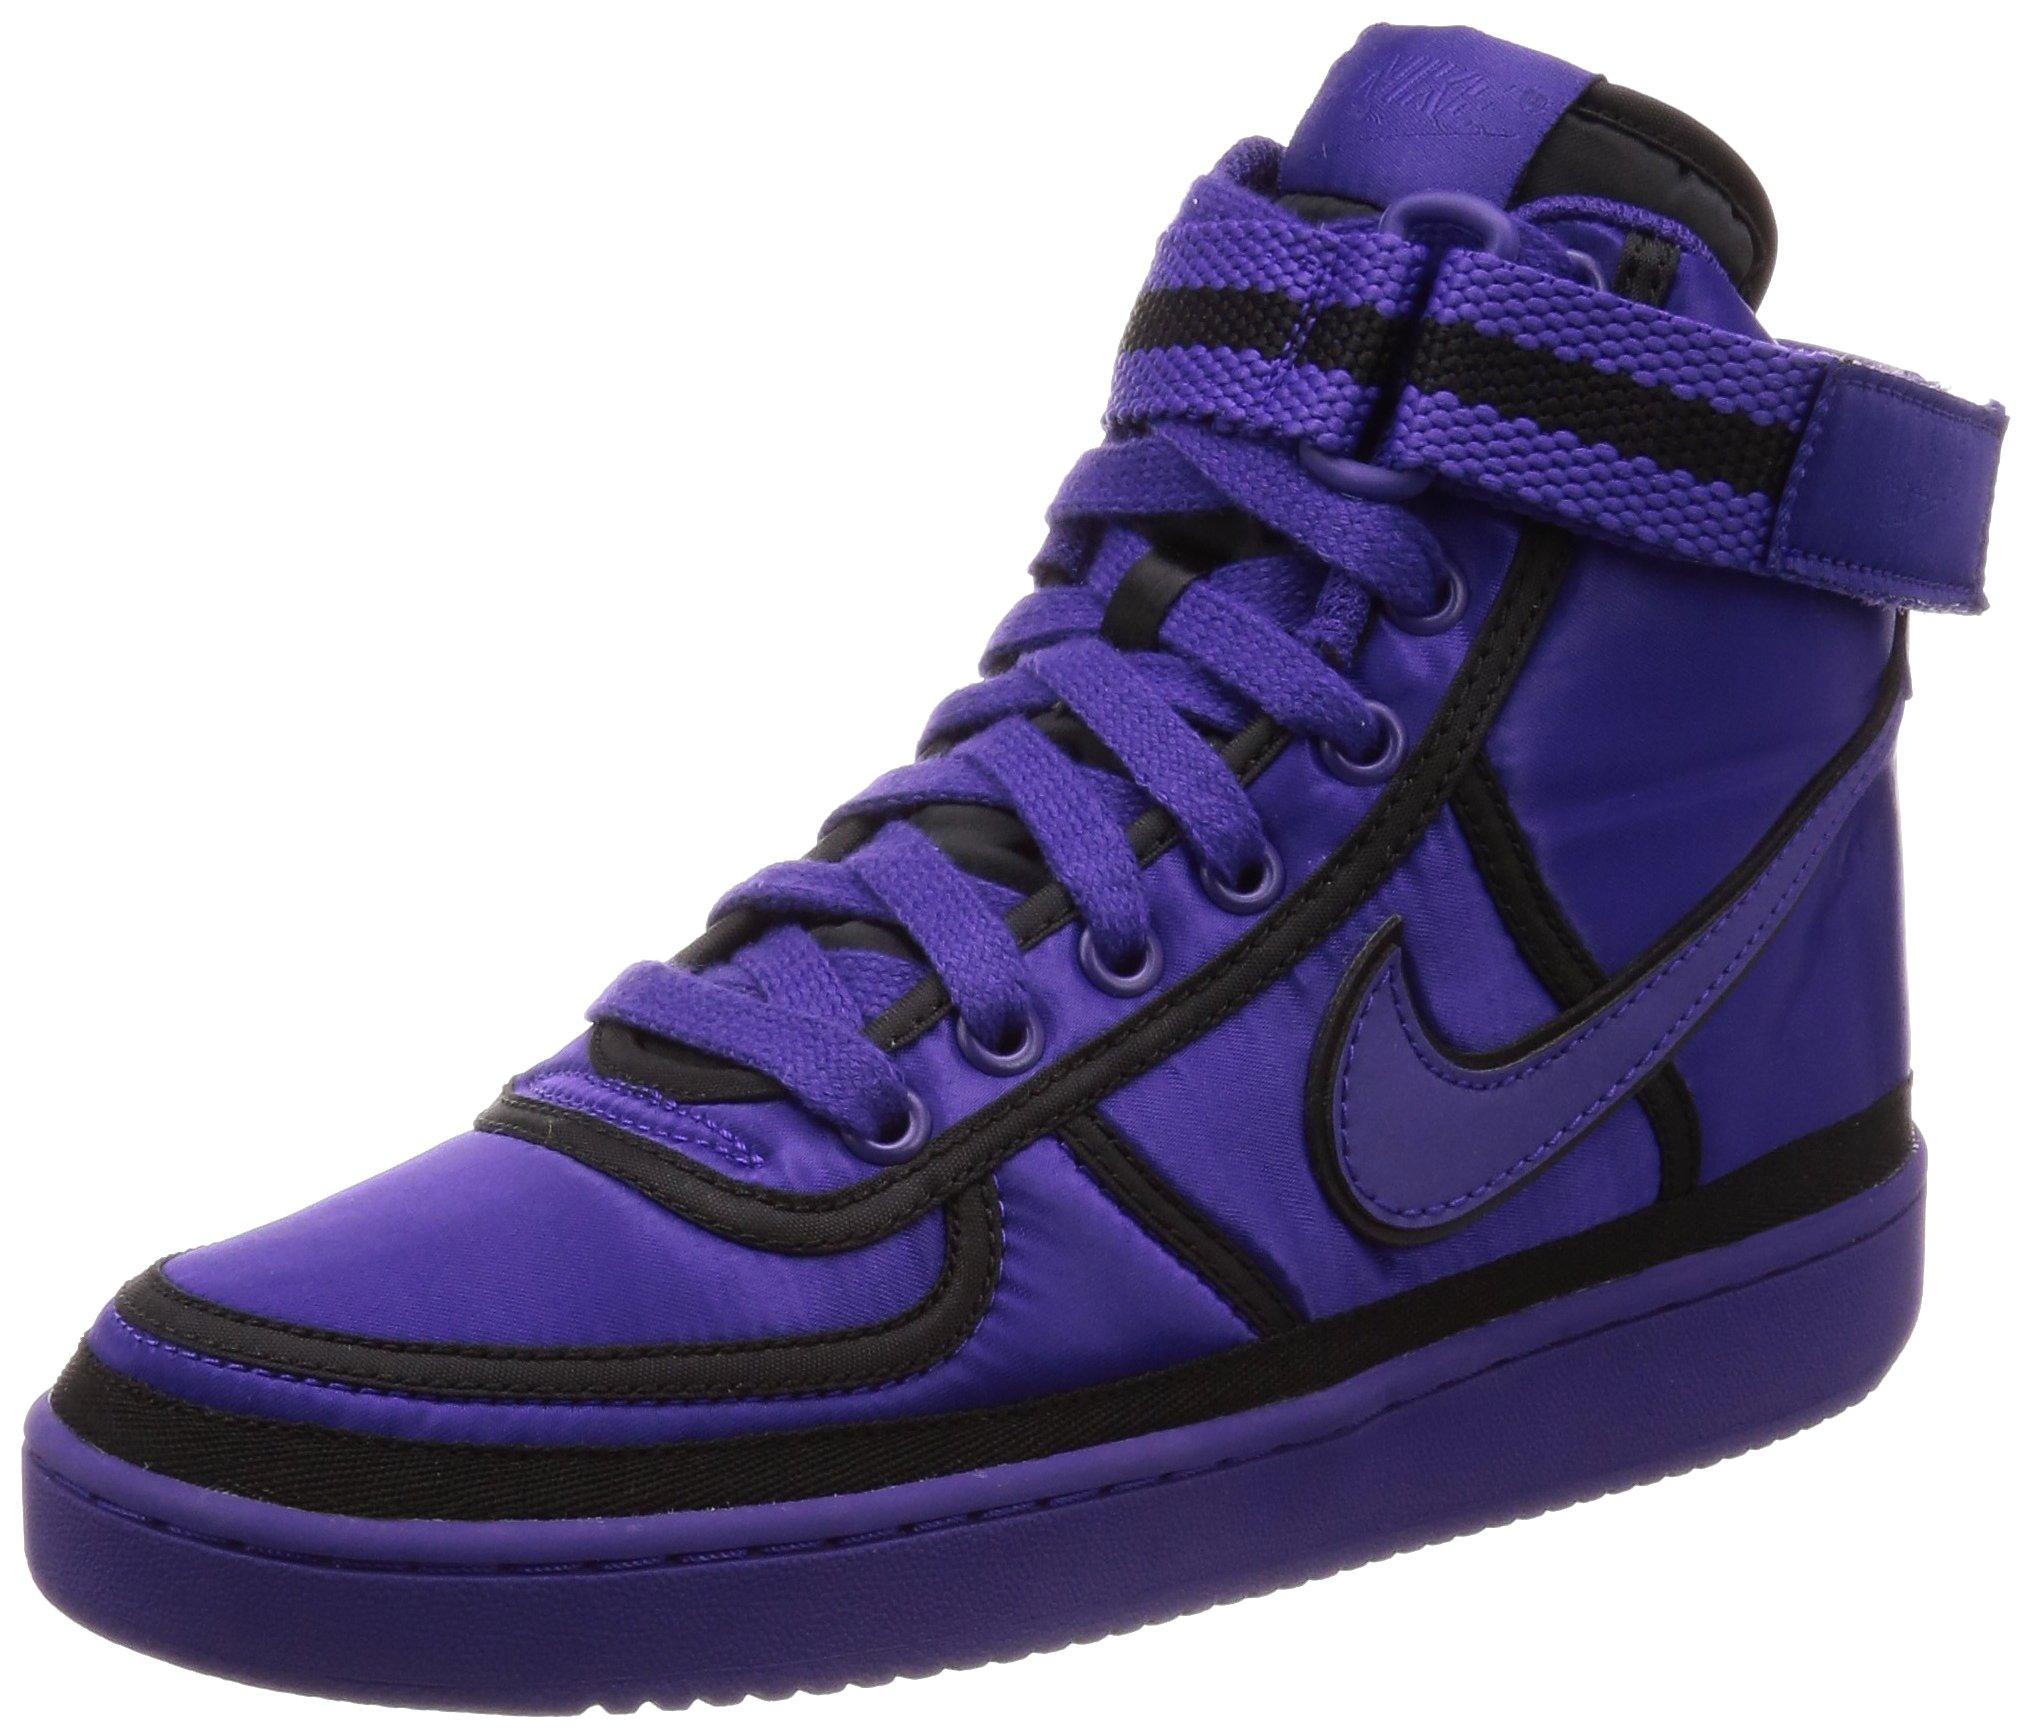 NIKE Vandal High Supreme QS PRPL, Court Purple, AQ2176-500 (10.5)